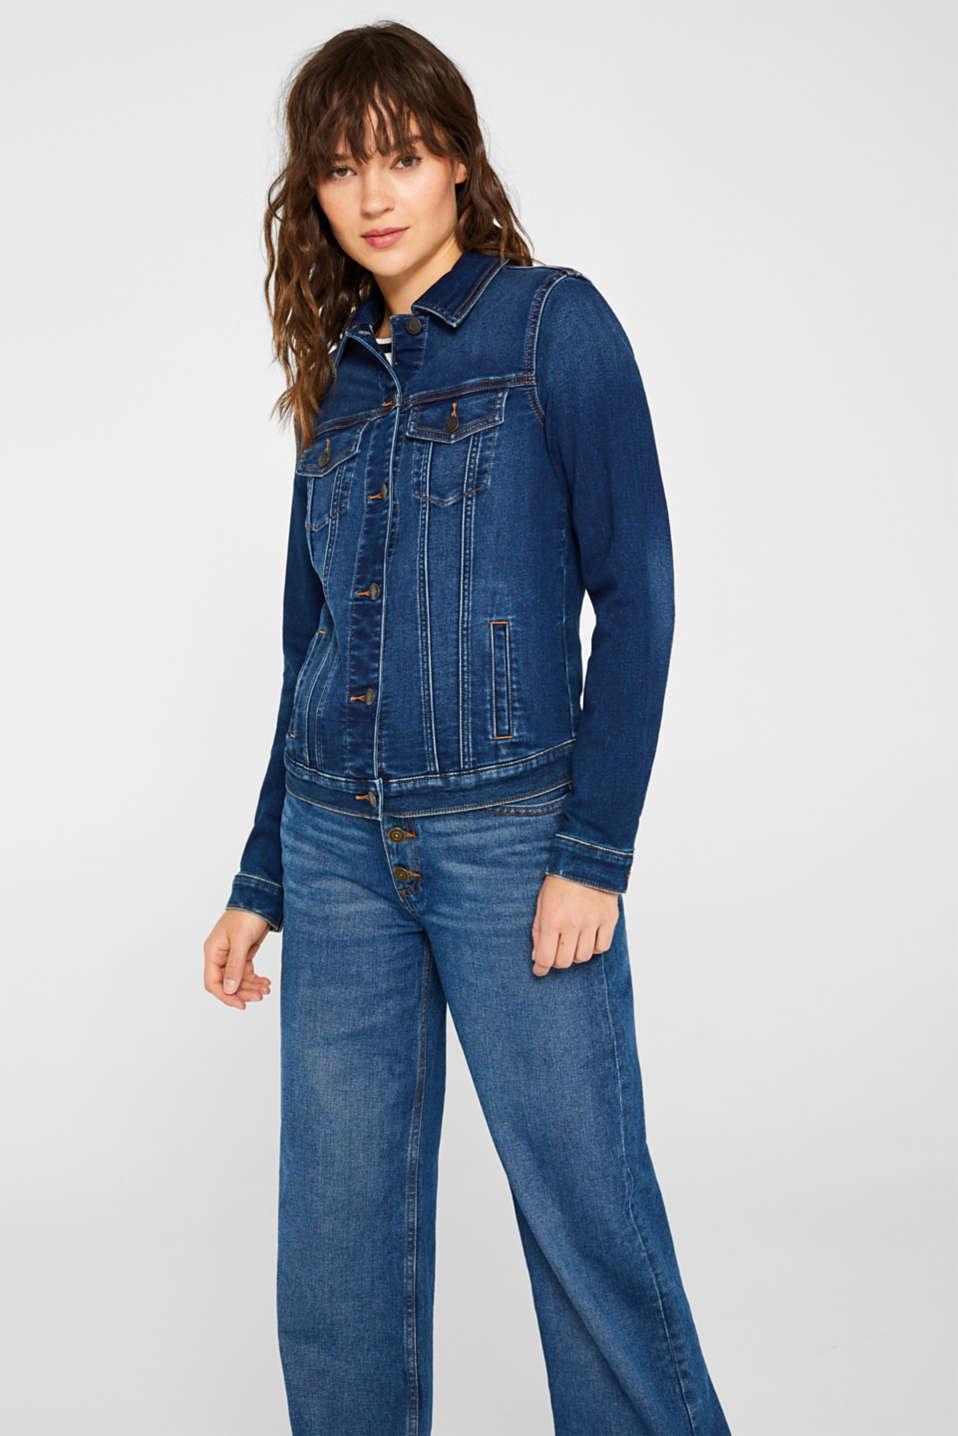 Jackets indoor denim, BLUE DARK WASH, detail image number 7